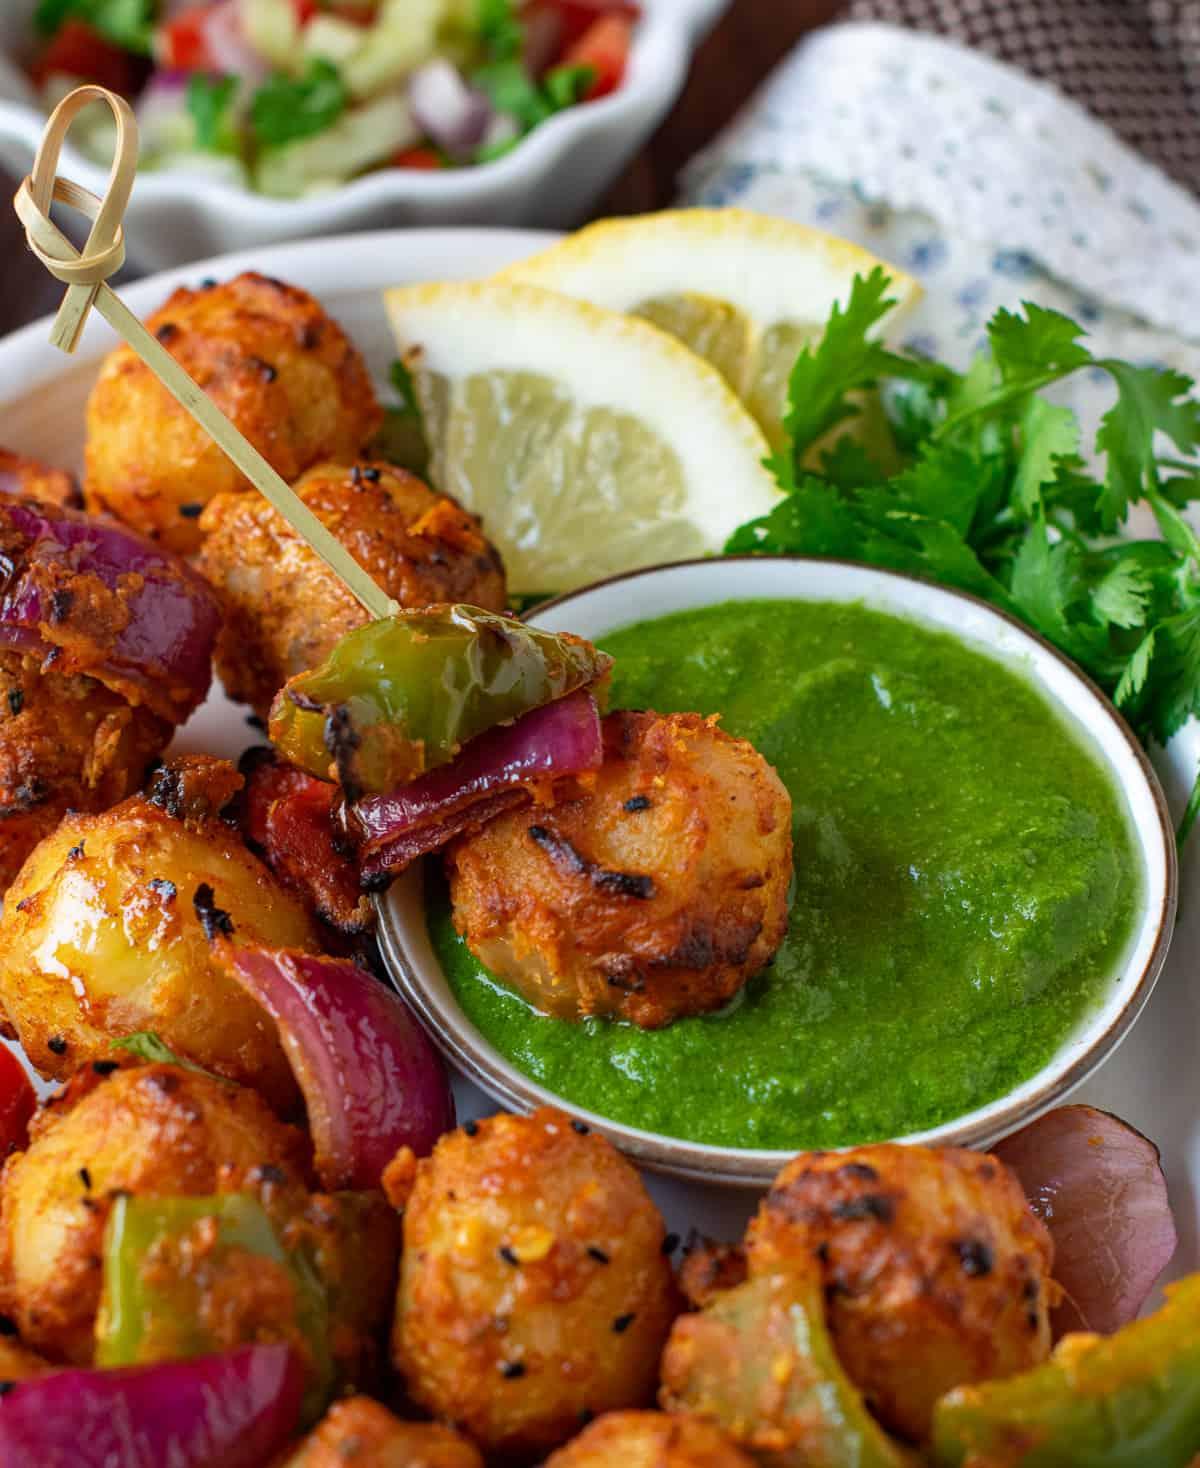 Achari aloo tikka dipped in green cilantro chutney